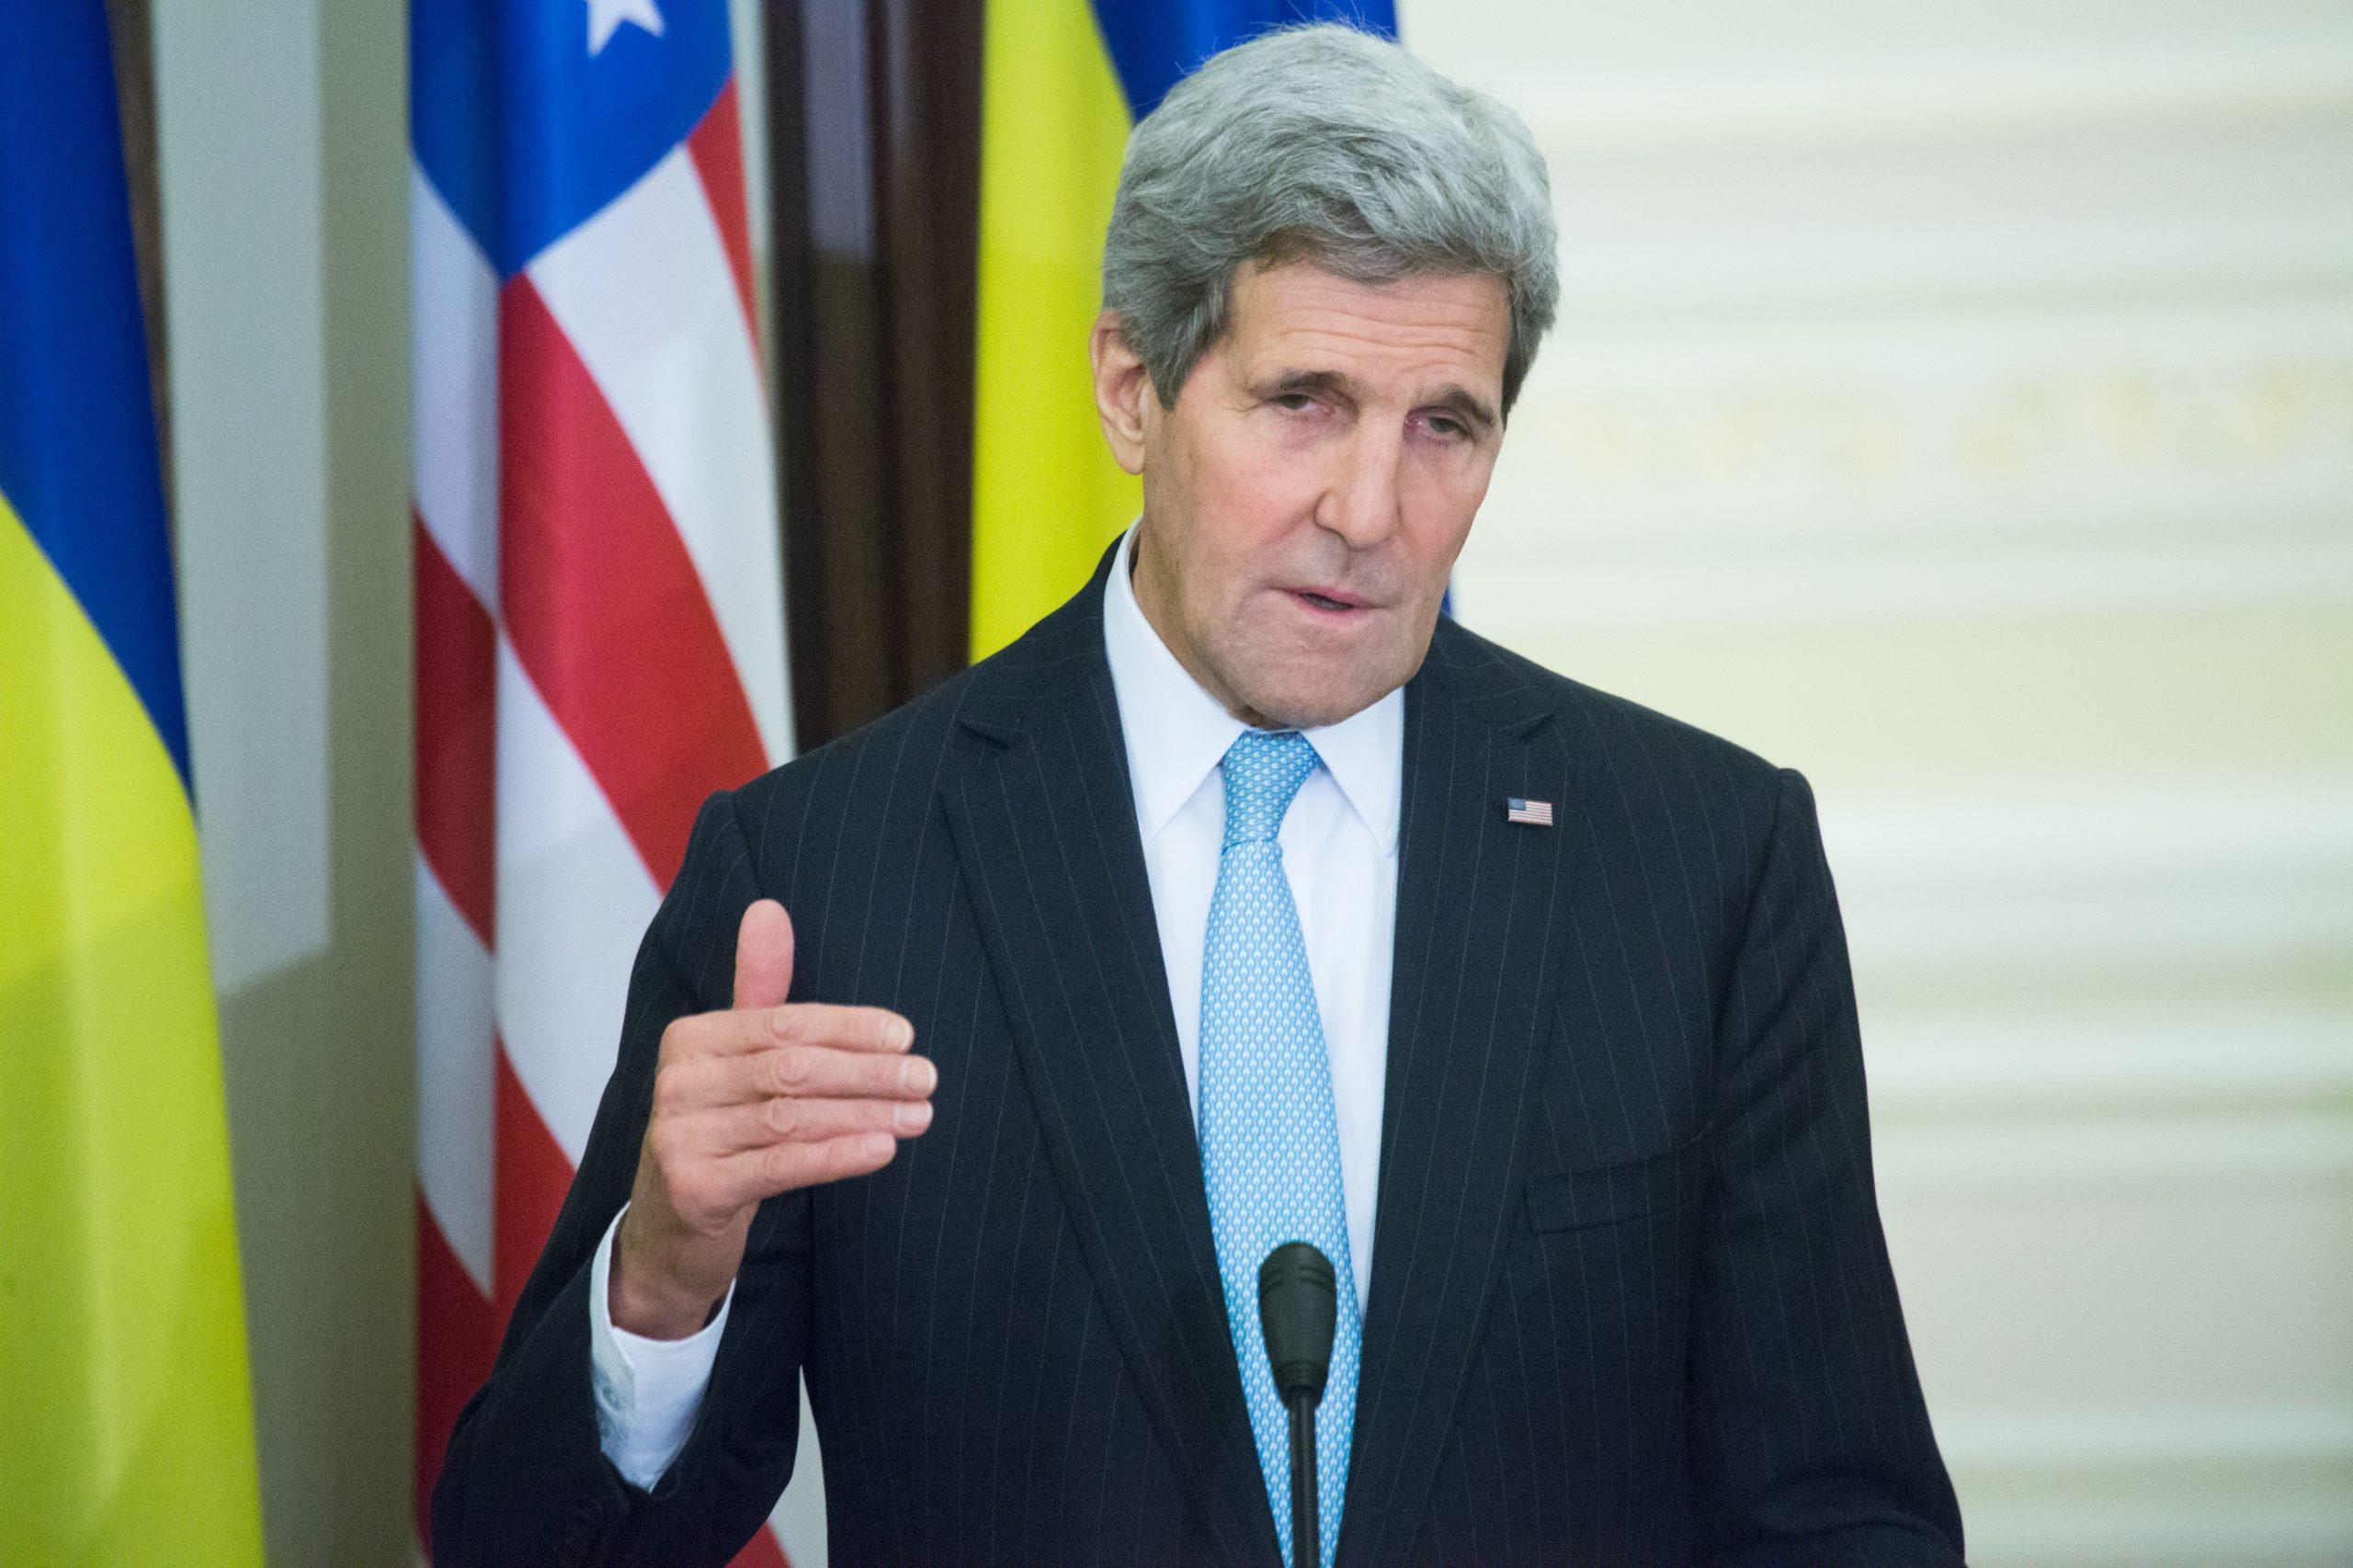 John Kerry addressing an audience.